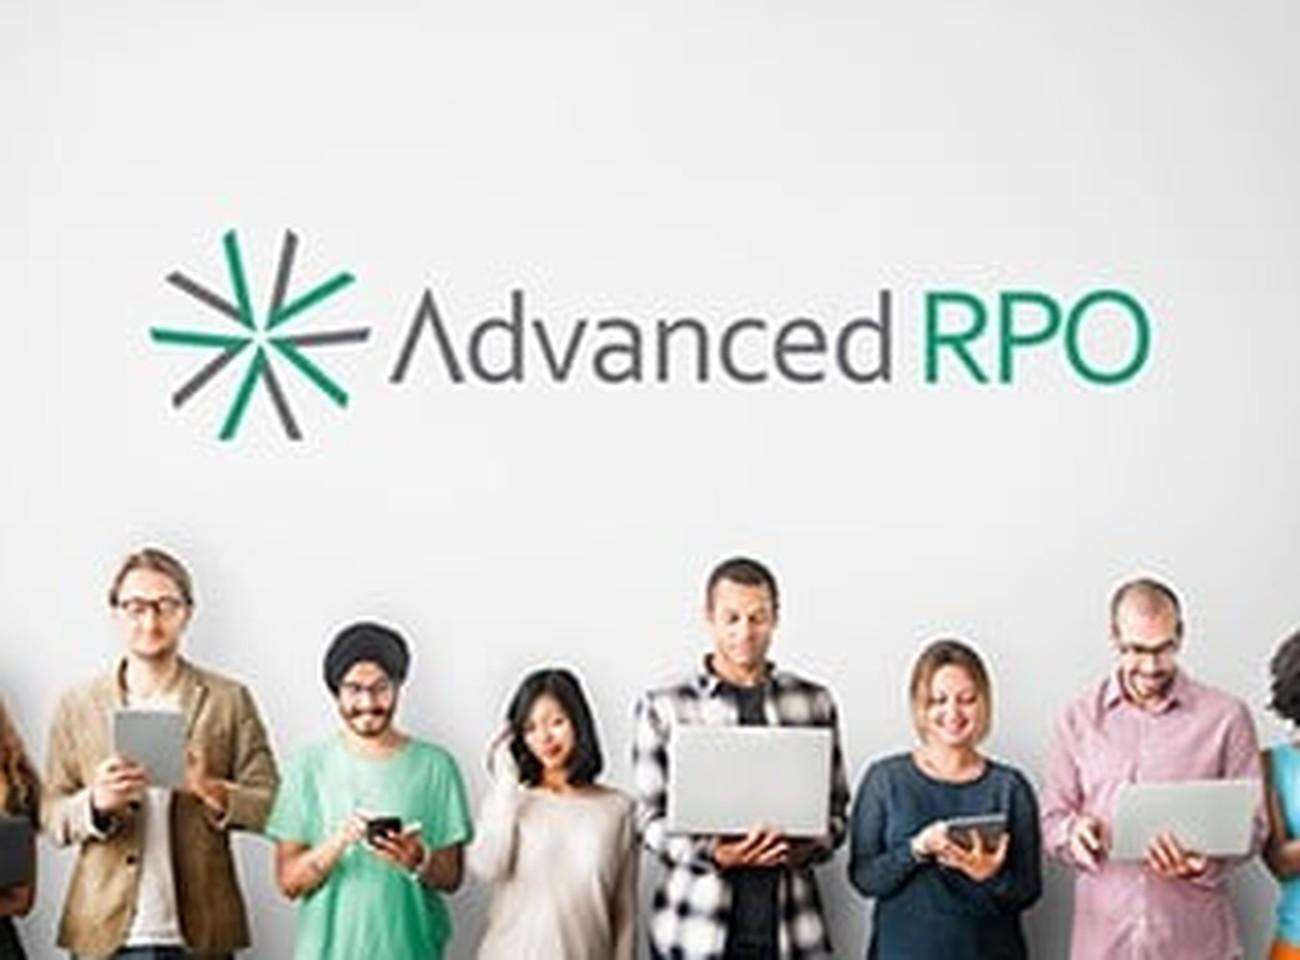 Advanced RPO Careers